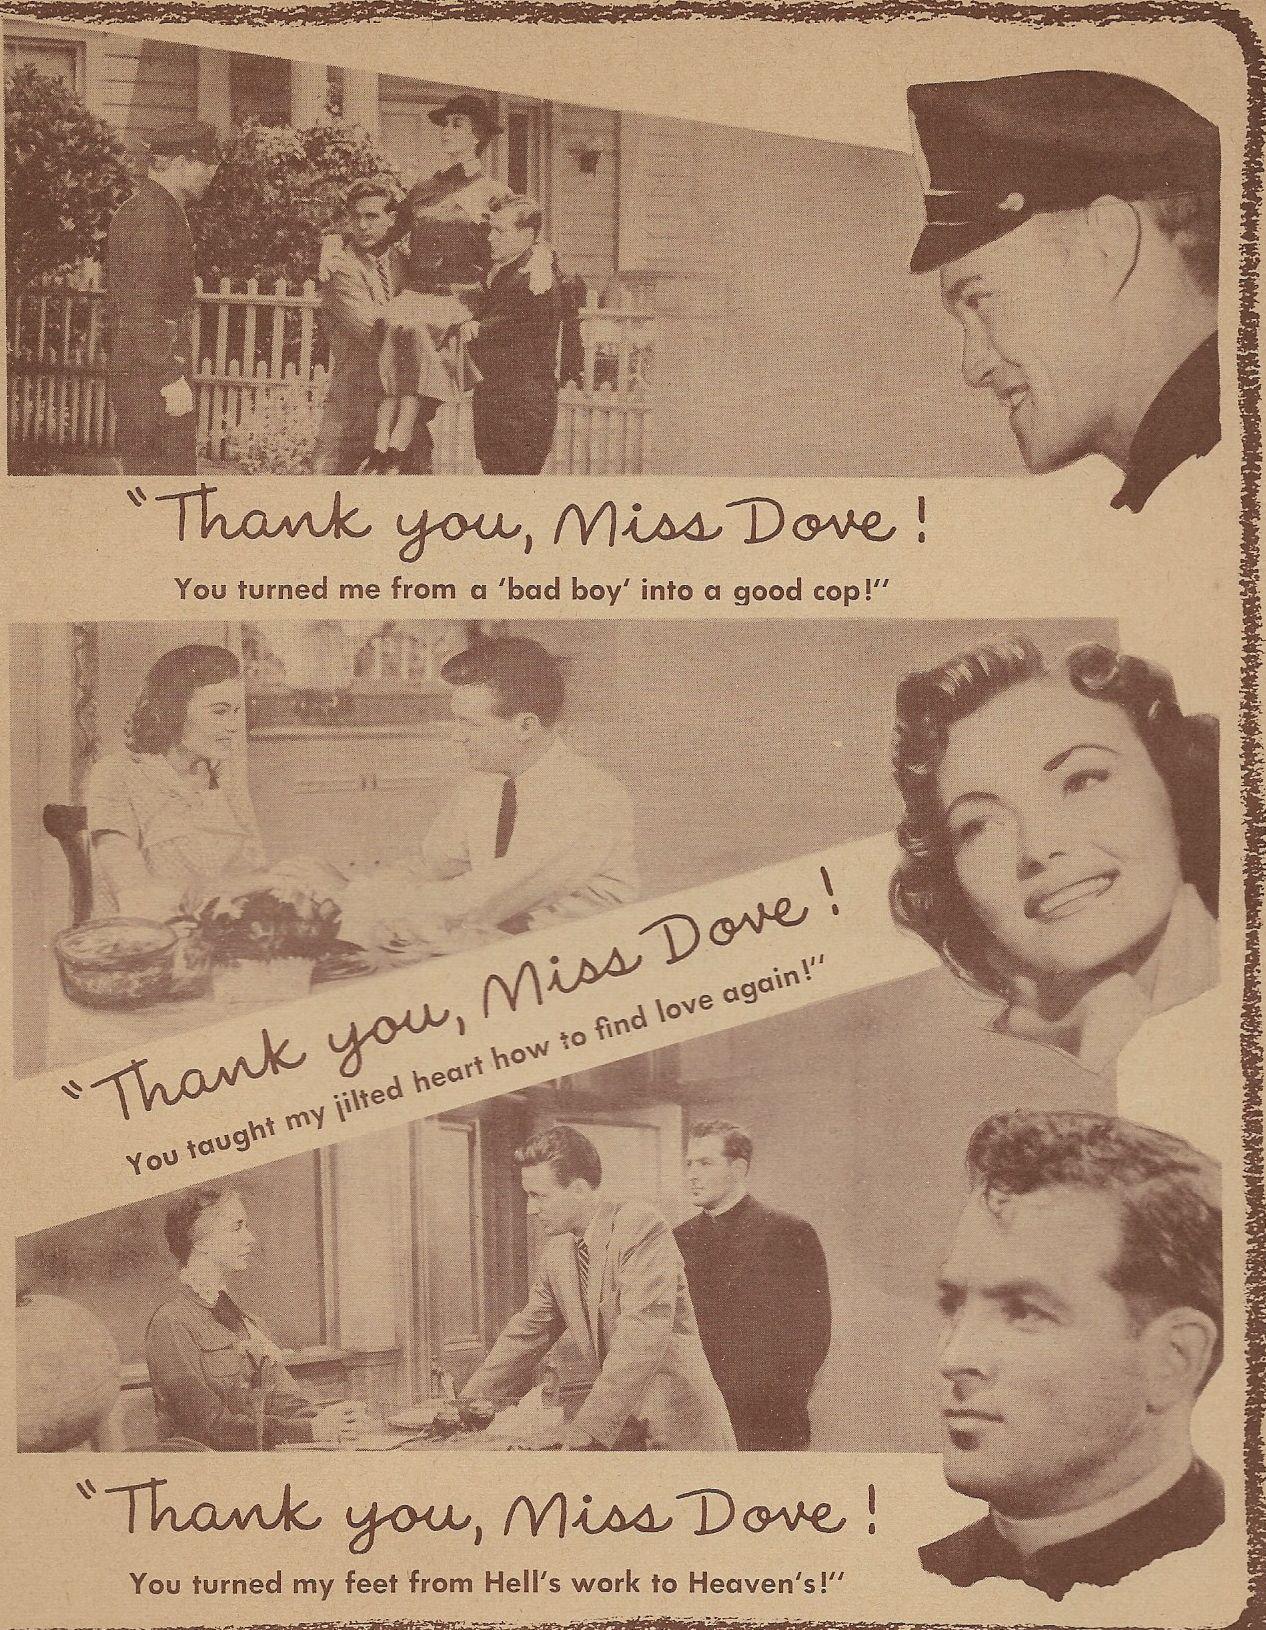 Biff Elliot, Jennifer Jones, Peggy Knudsen, Robert Stack, and Mary Wickes in Good Morning, Miss Dove (1955)